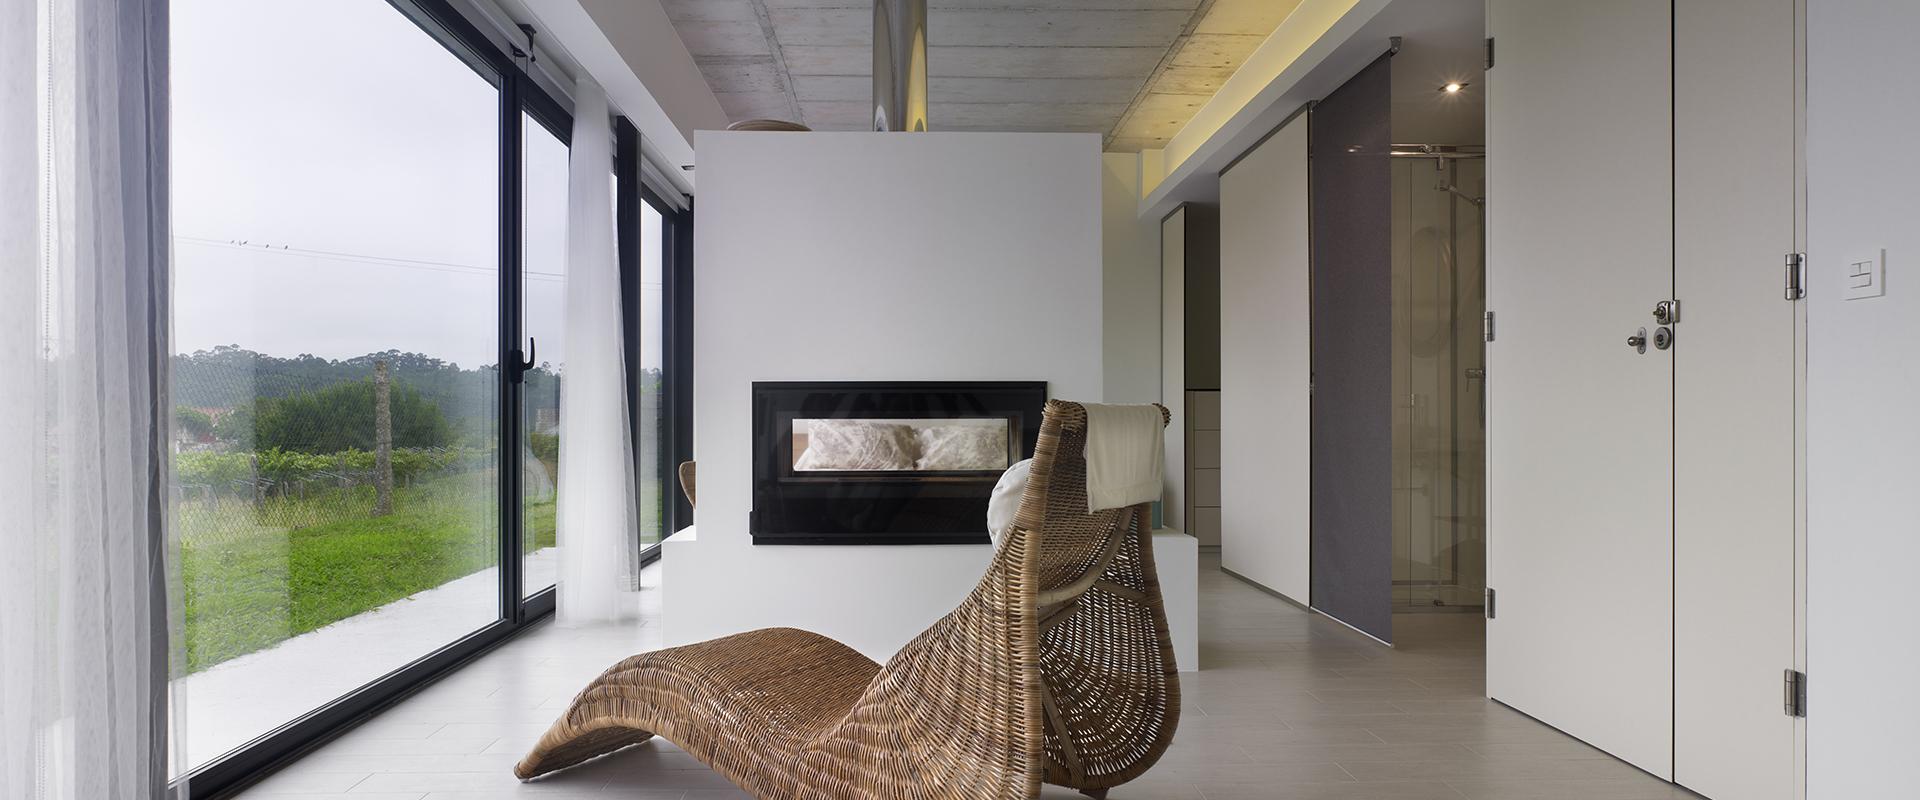 calefaccion vivienda nan arquitectos madrid pontevedra